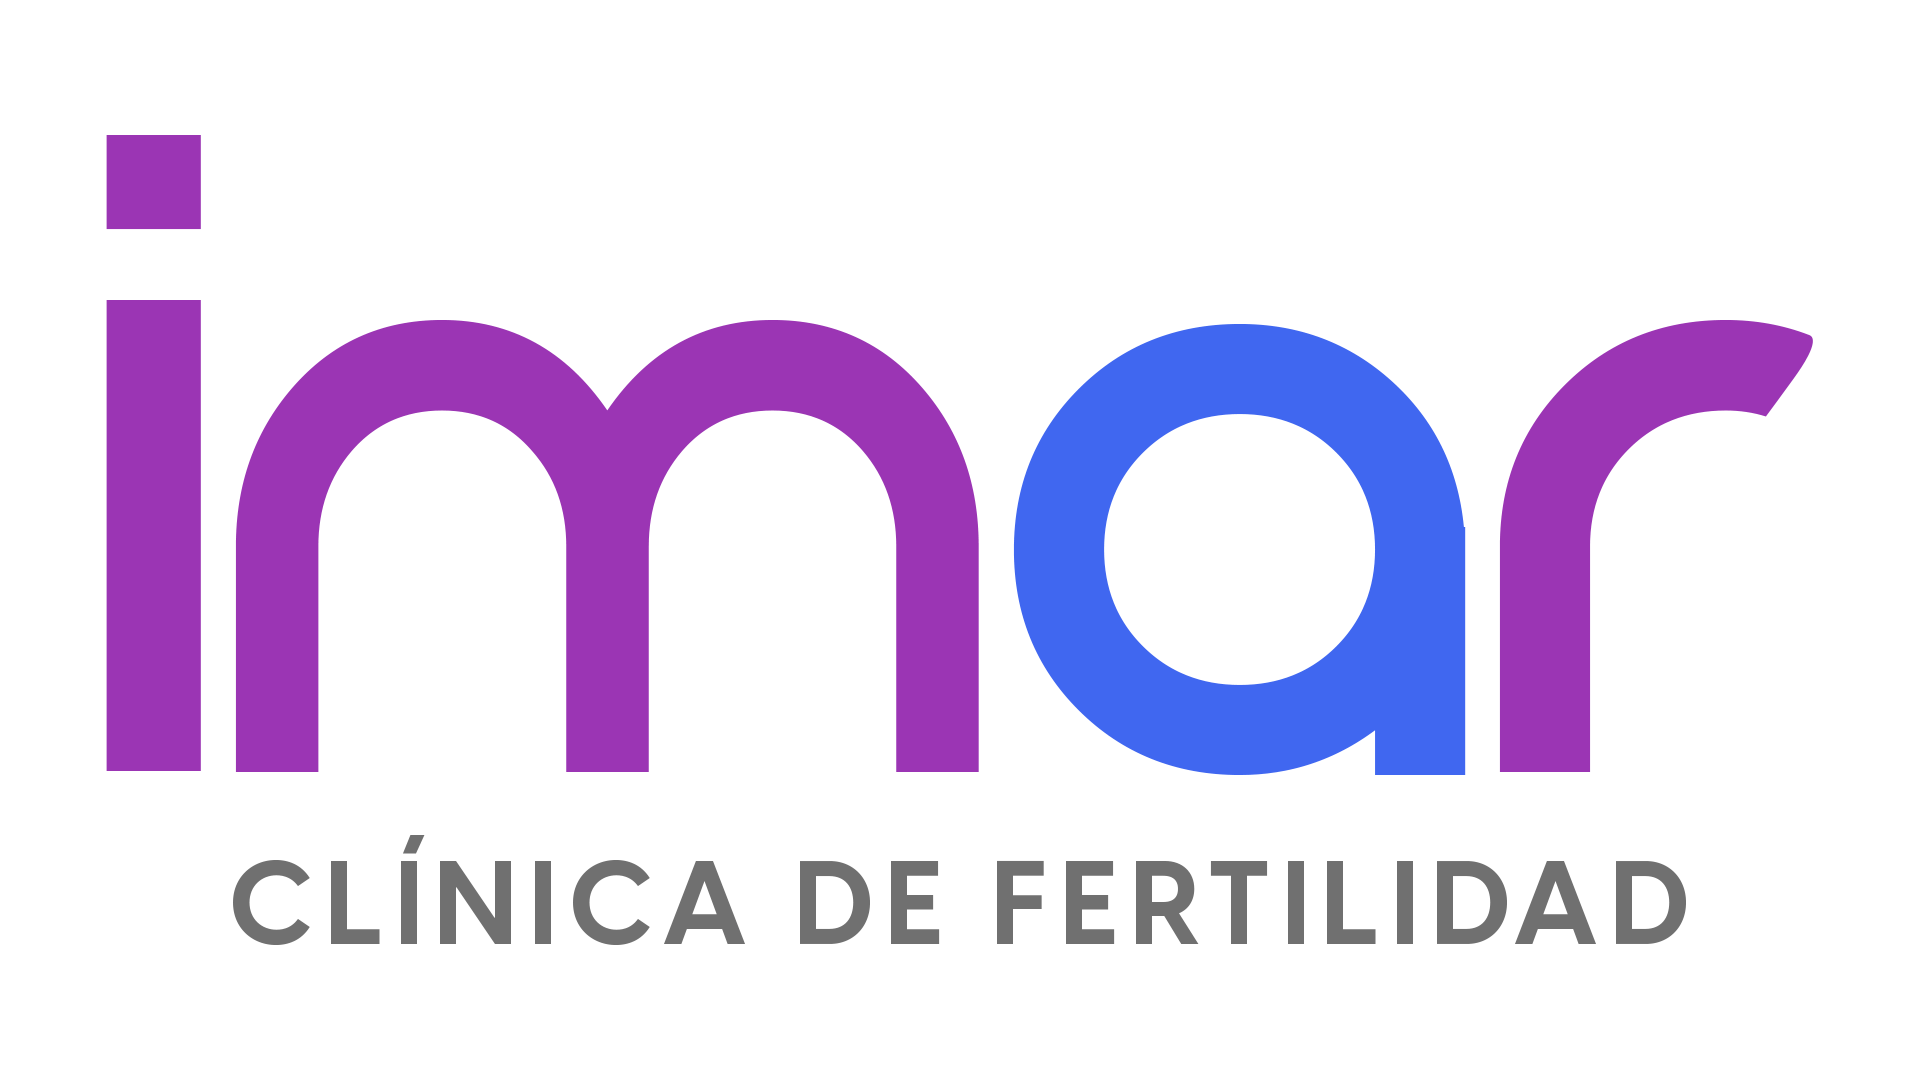 Clinica Imar